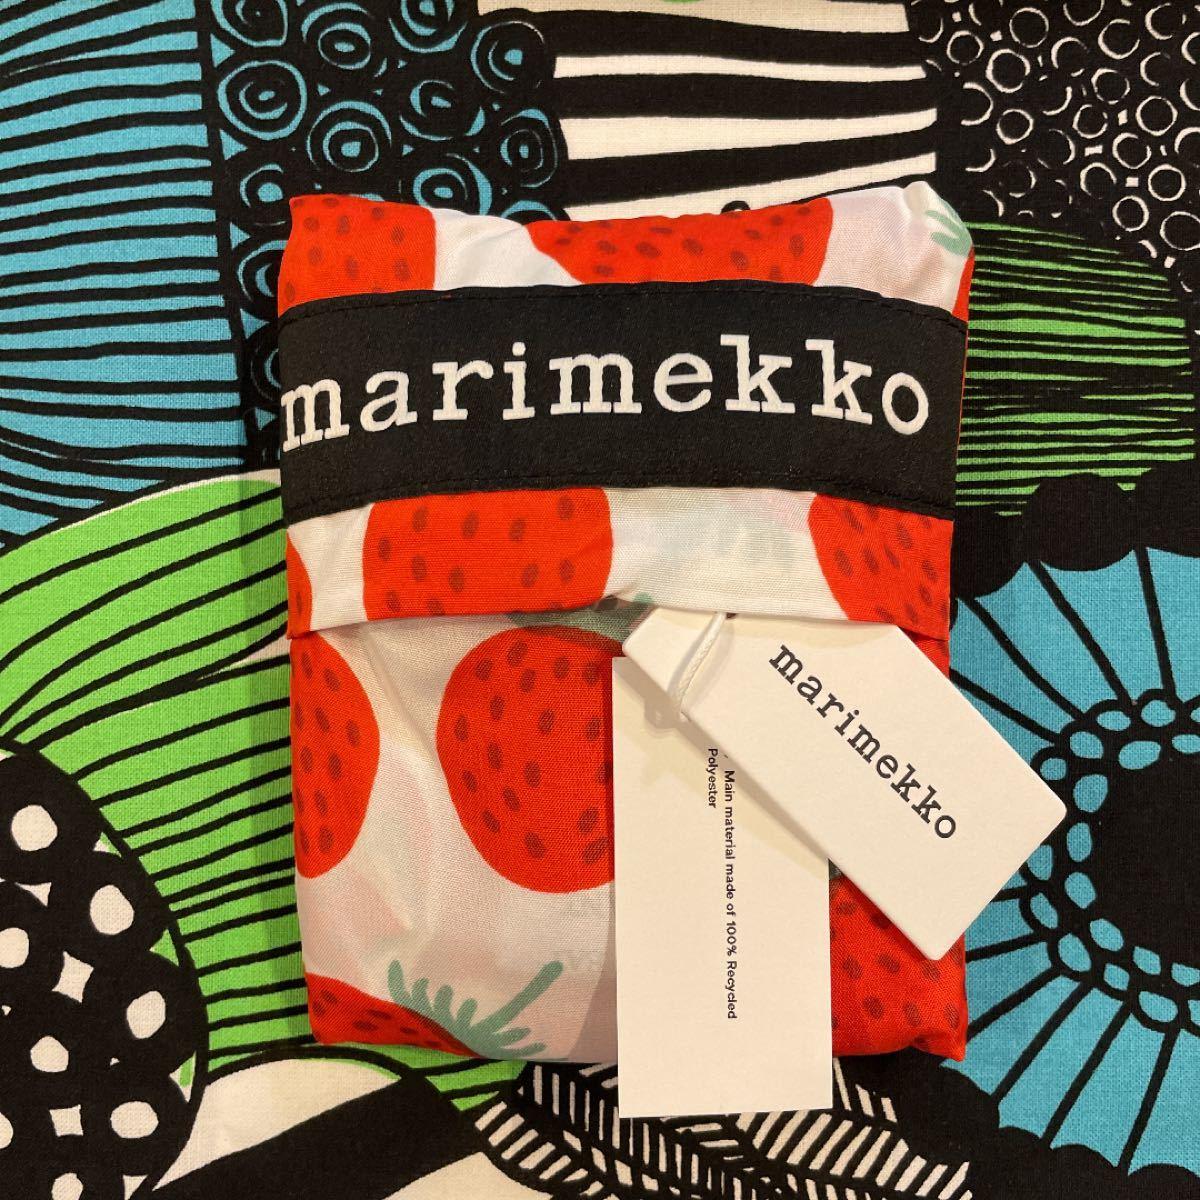 marimekko マリメッコ Mansikka イチゴ柄エコバッグ 新品送料込